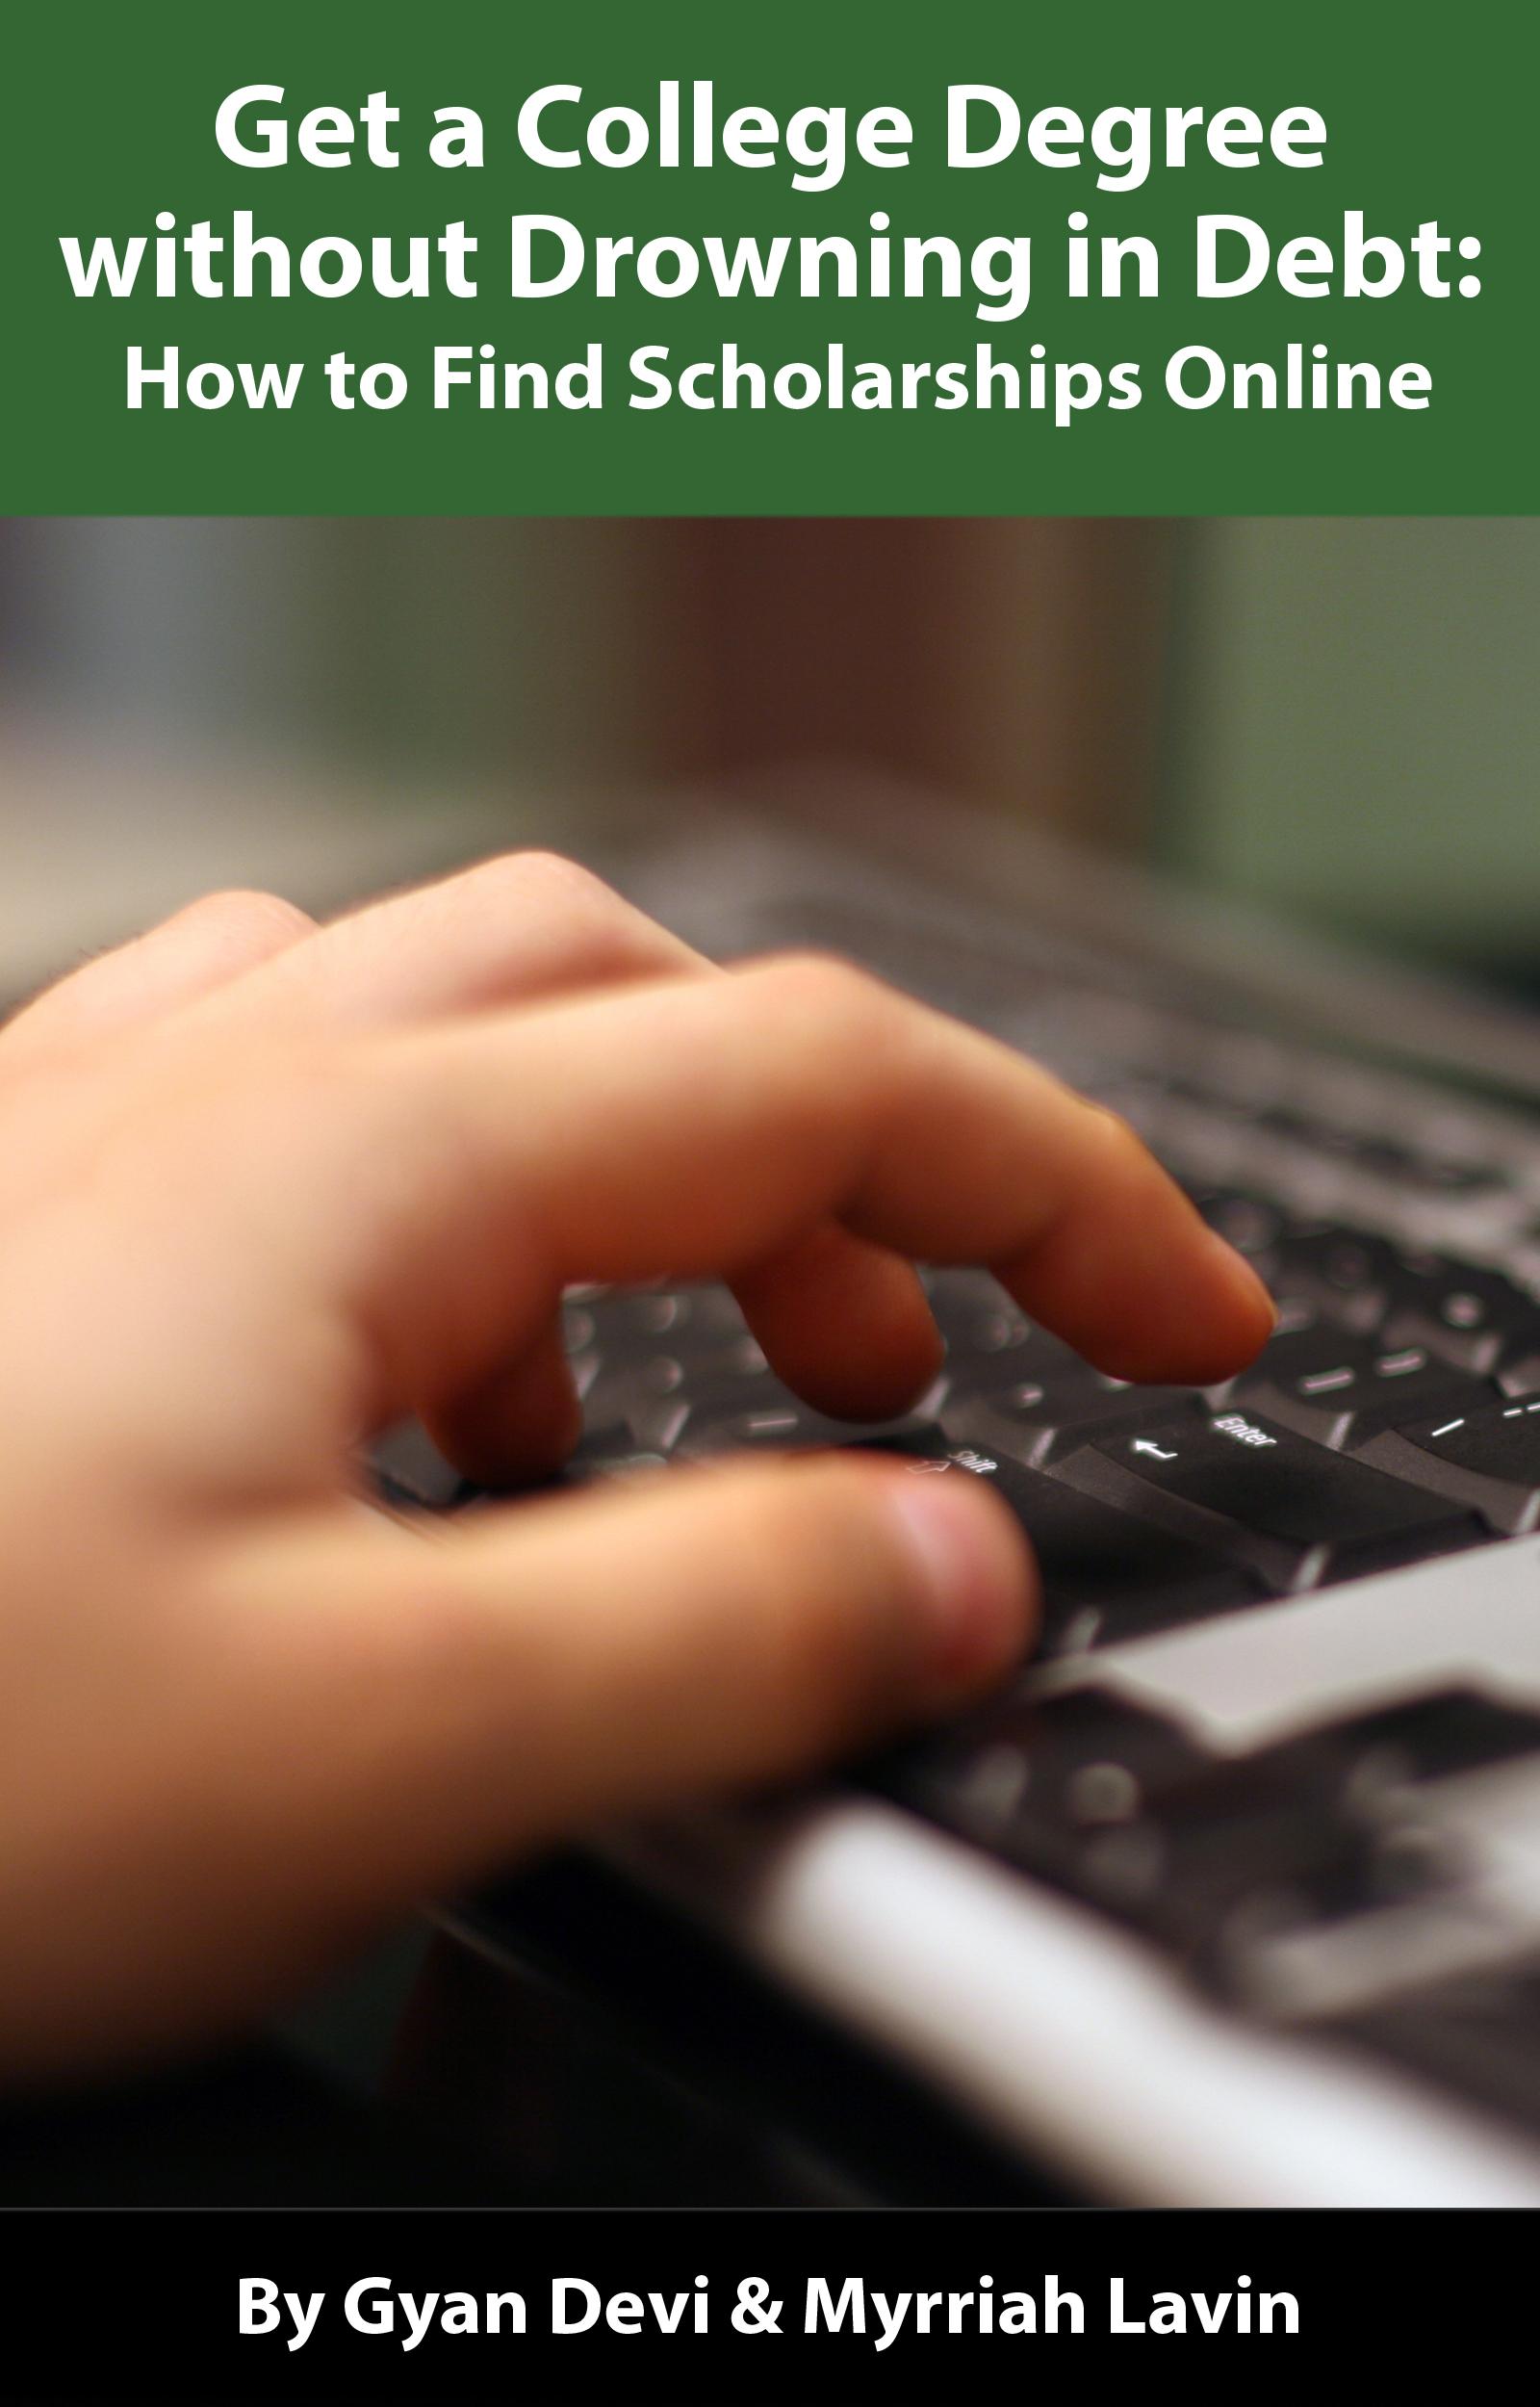 Find Scholarships Online